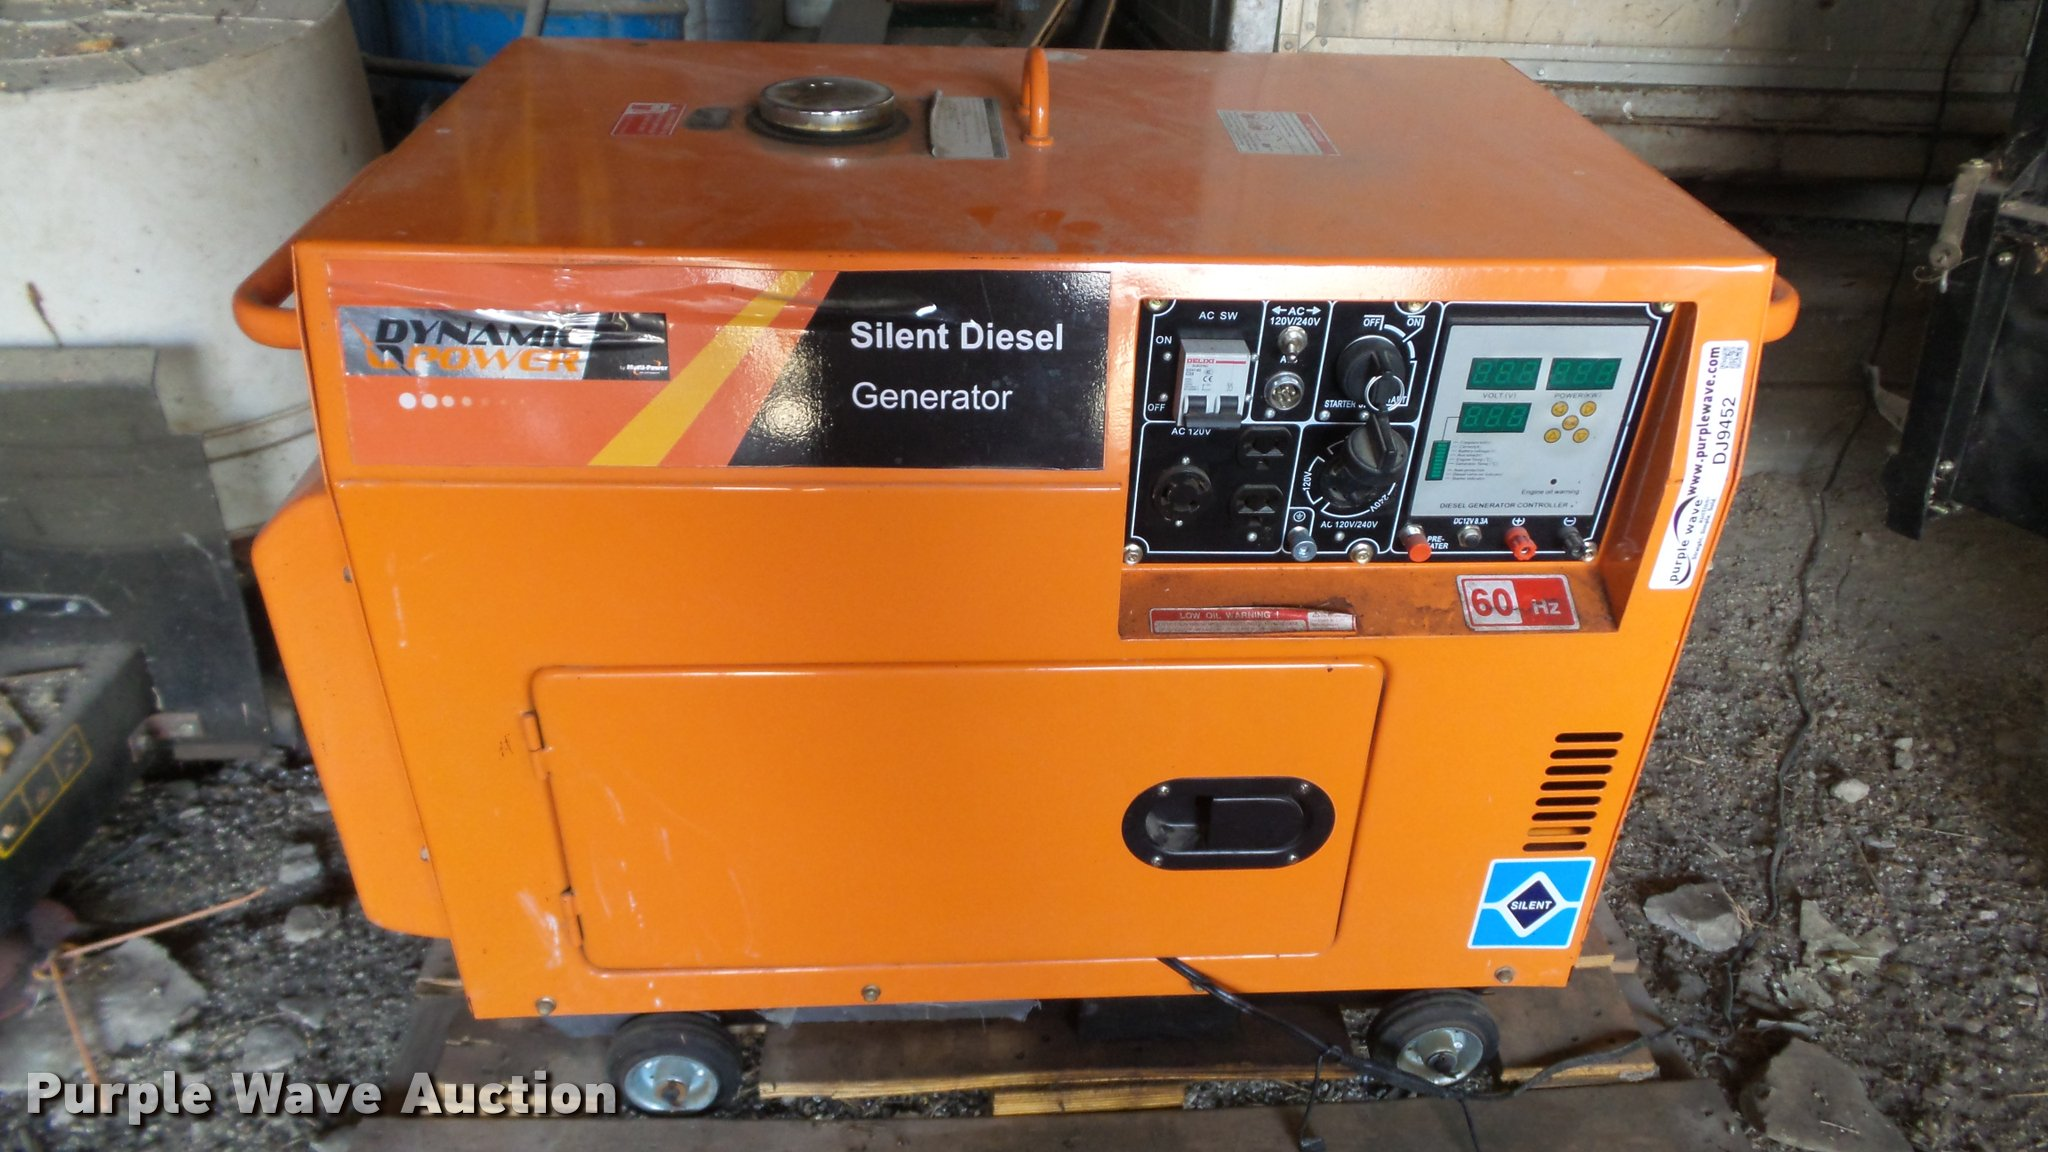 Dynamic Power Silent sel generator Item DJ9452